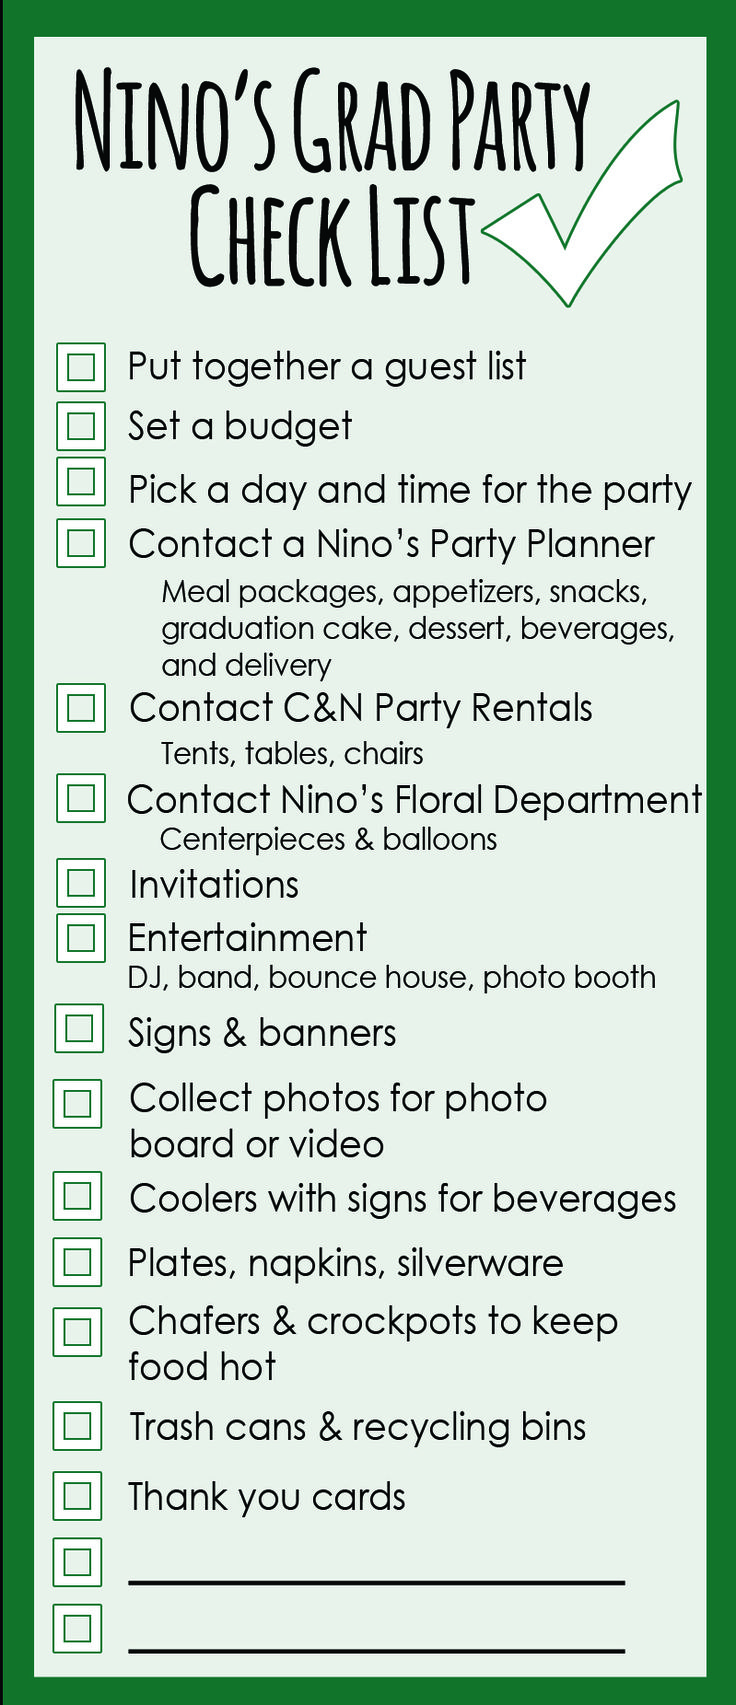 College Graduation Party Checklist | Graduation Party Planning Checklist